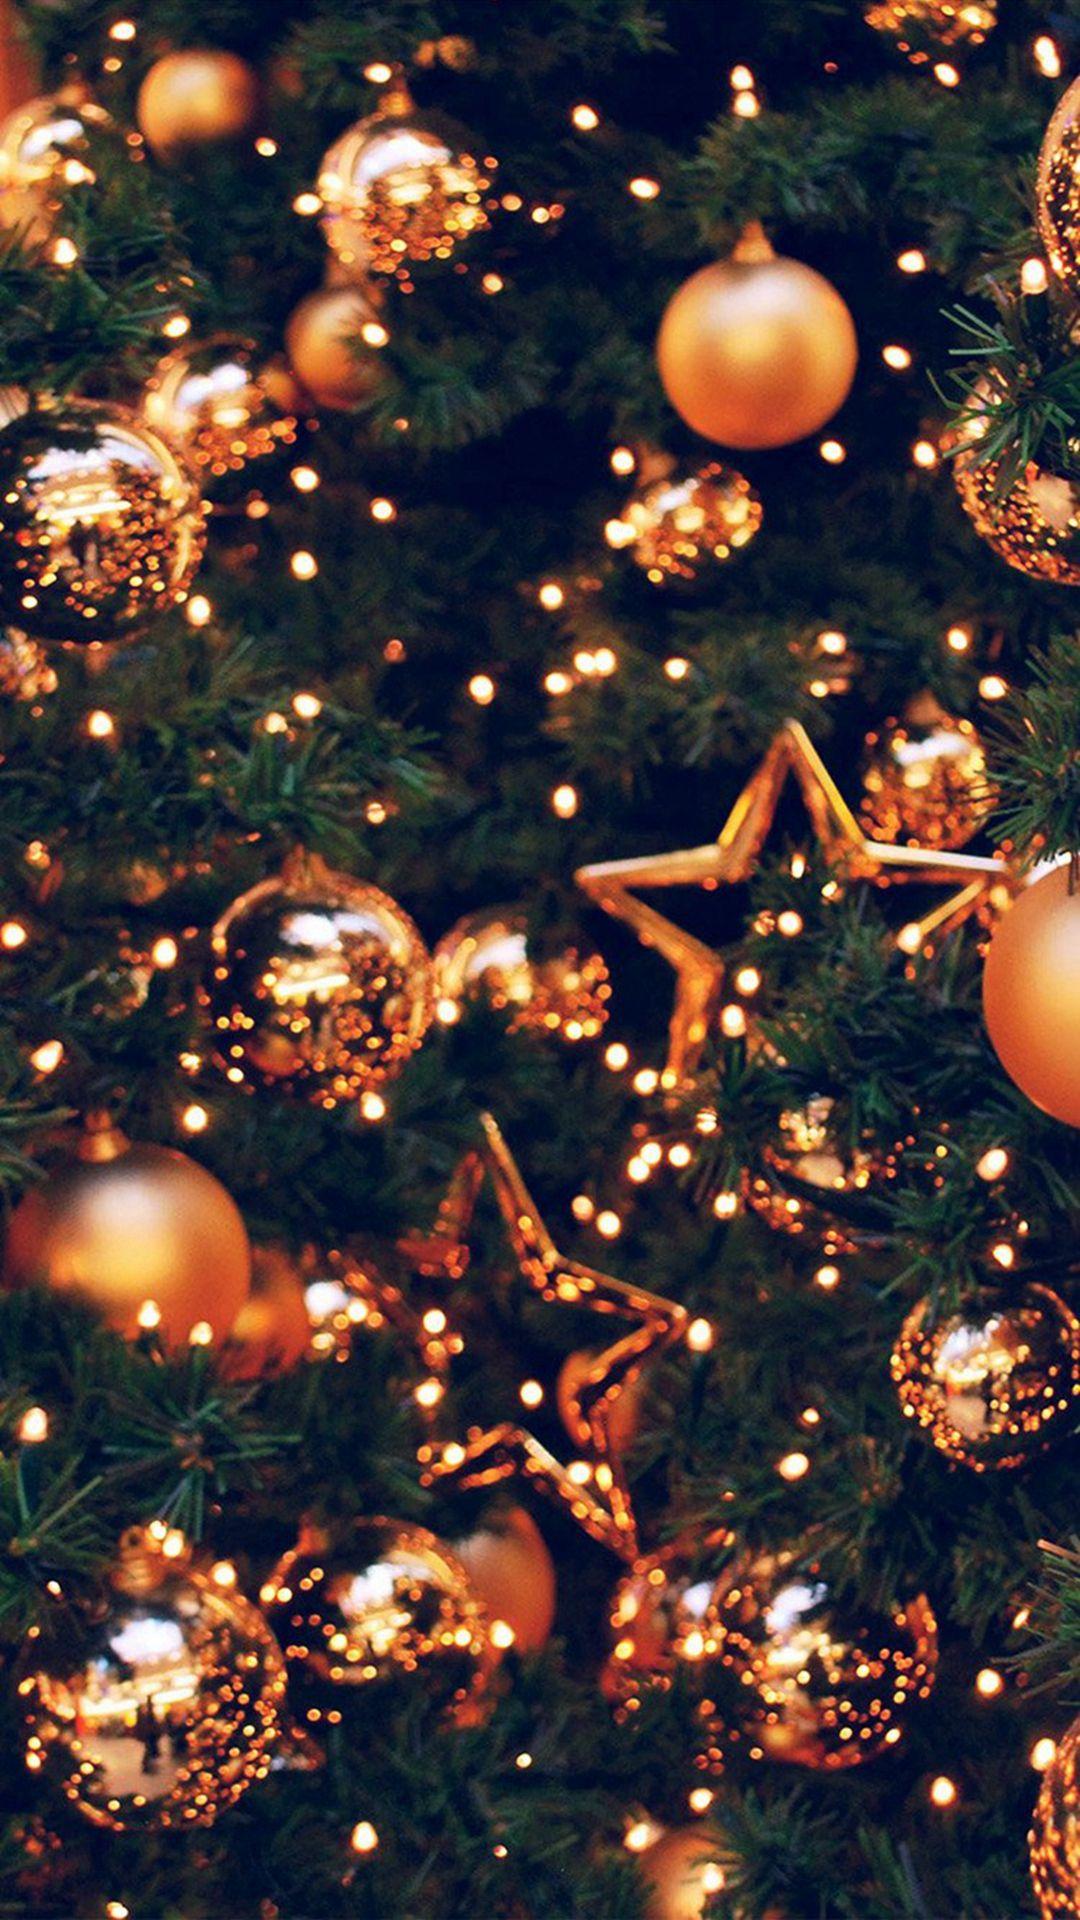 Christmas Lockscreen, Christmas Wallpaper Iphone Tumblr, Tumblr Iphone  Wallpaper, Merry Christmas Wallpaper,